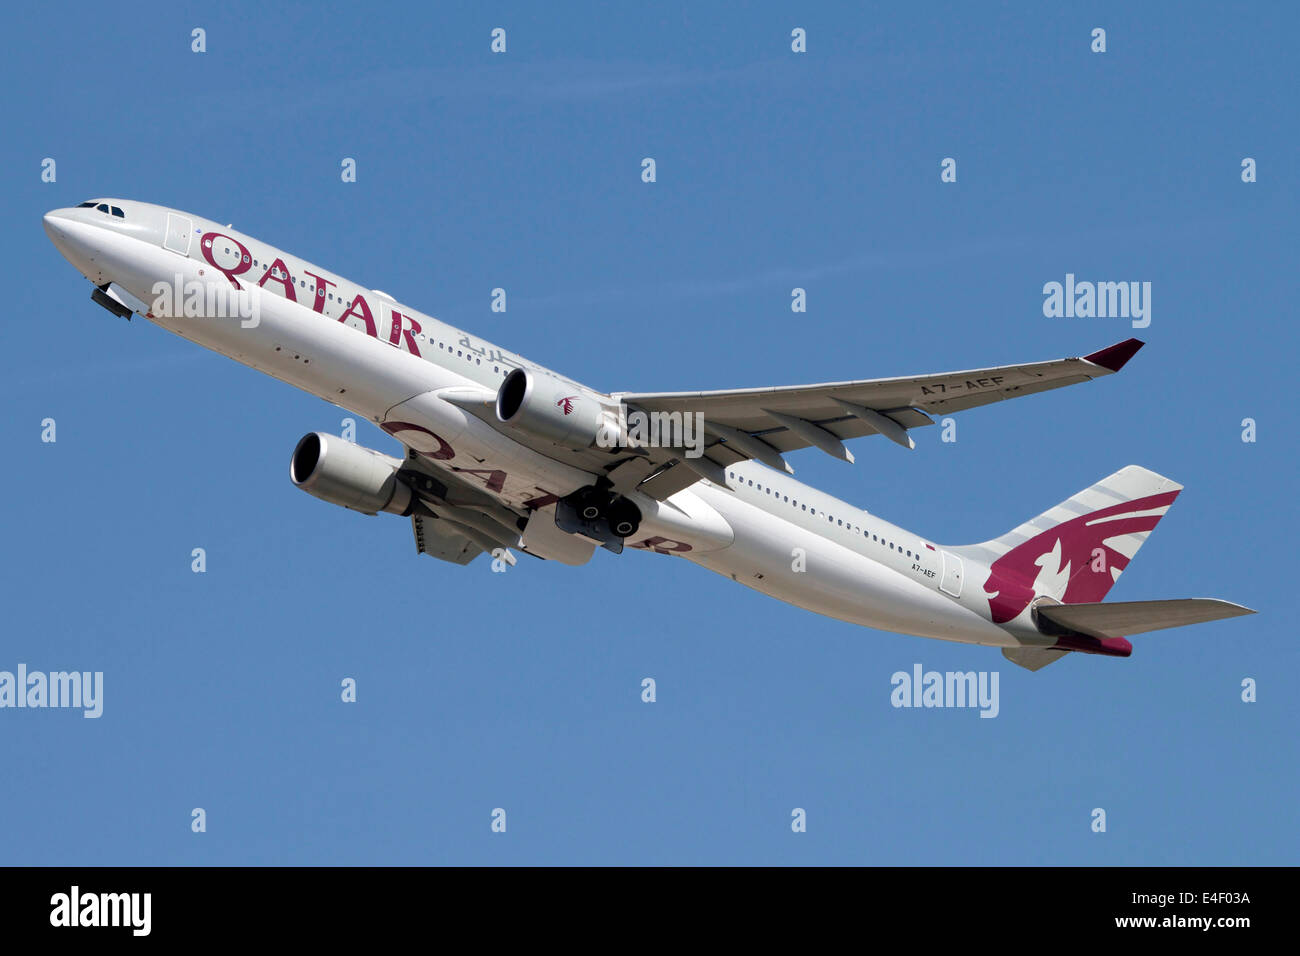 Airbus A330-300 of Qatar Airways. - Stock Image